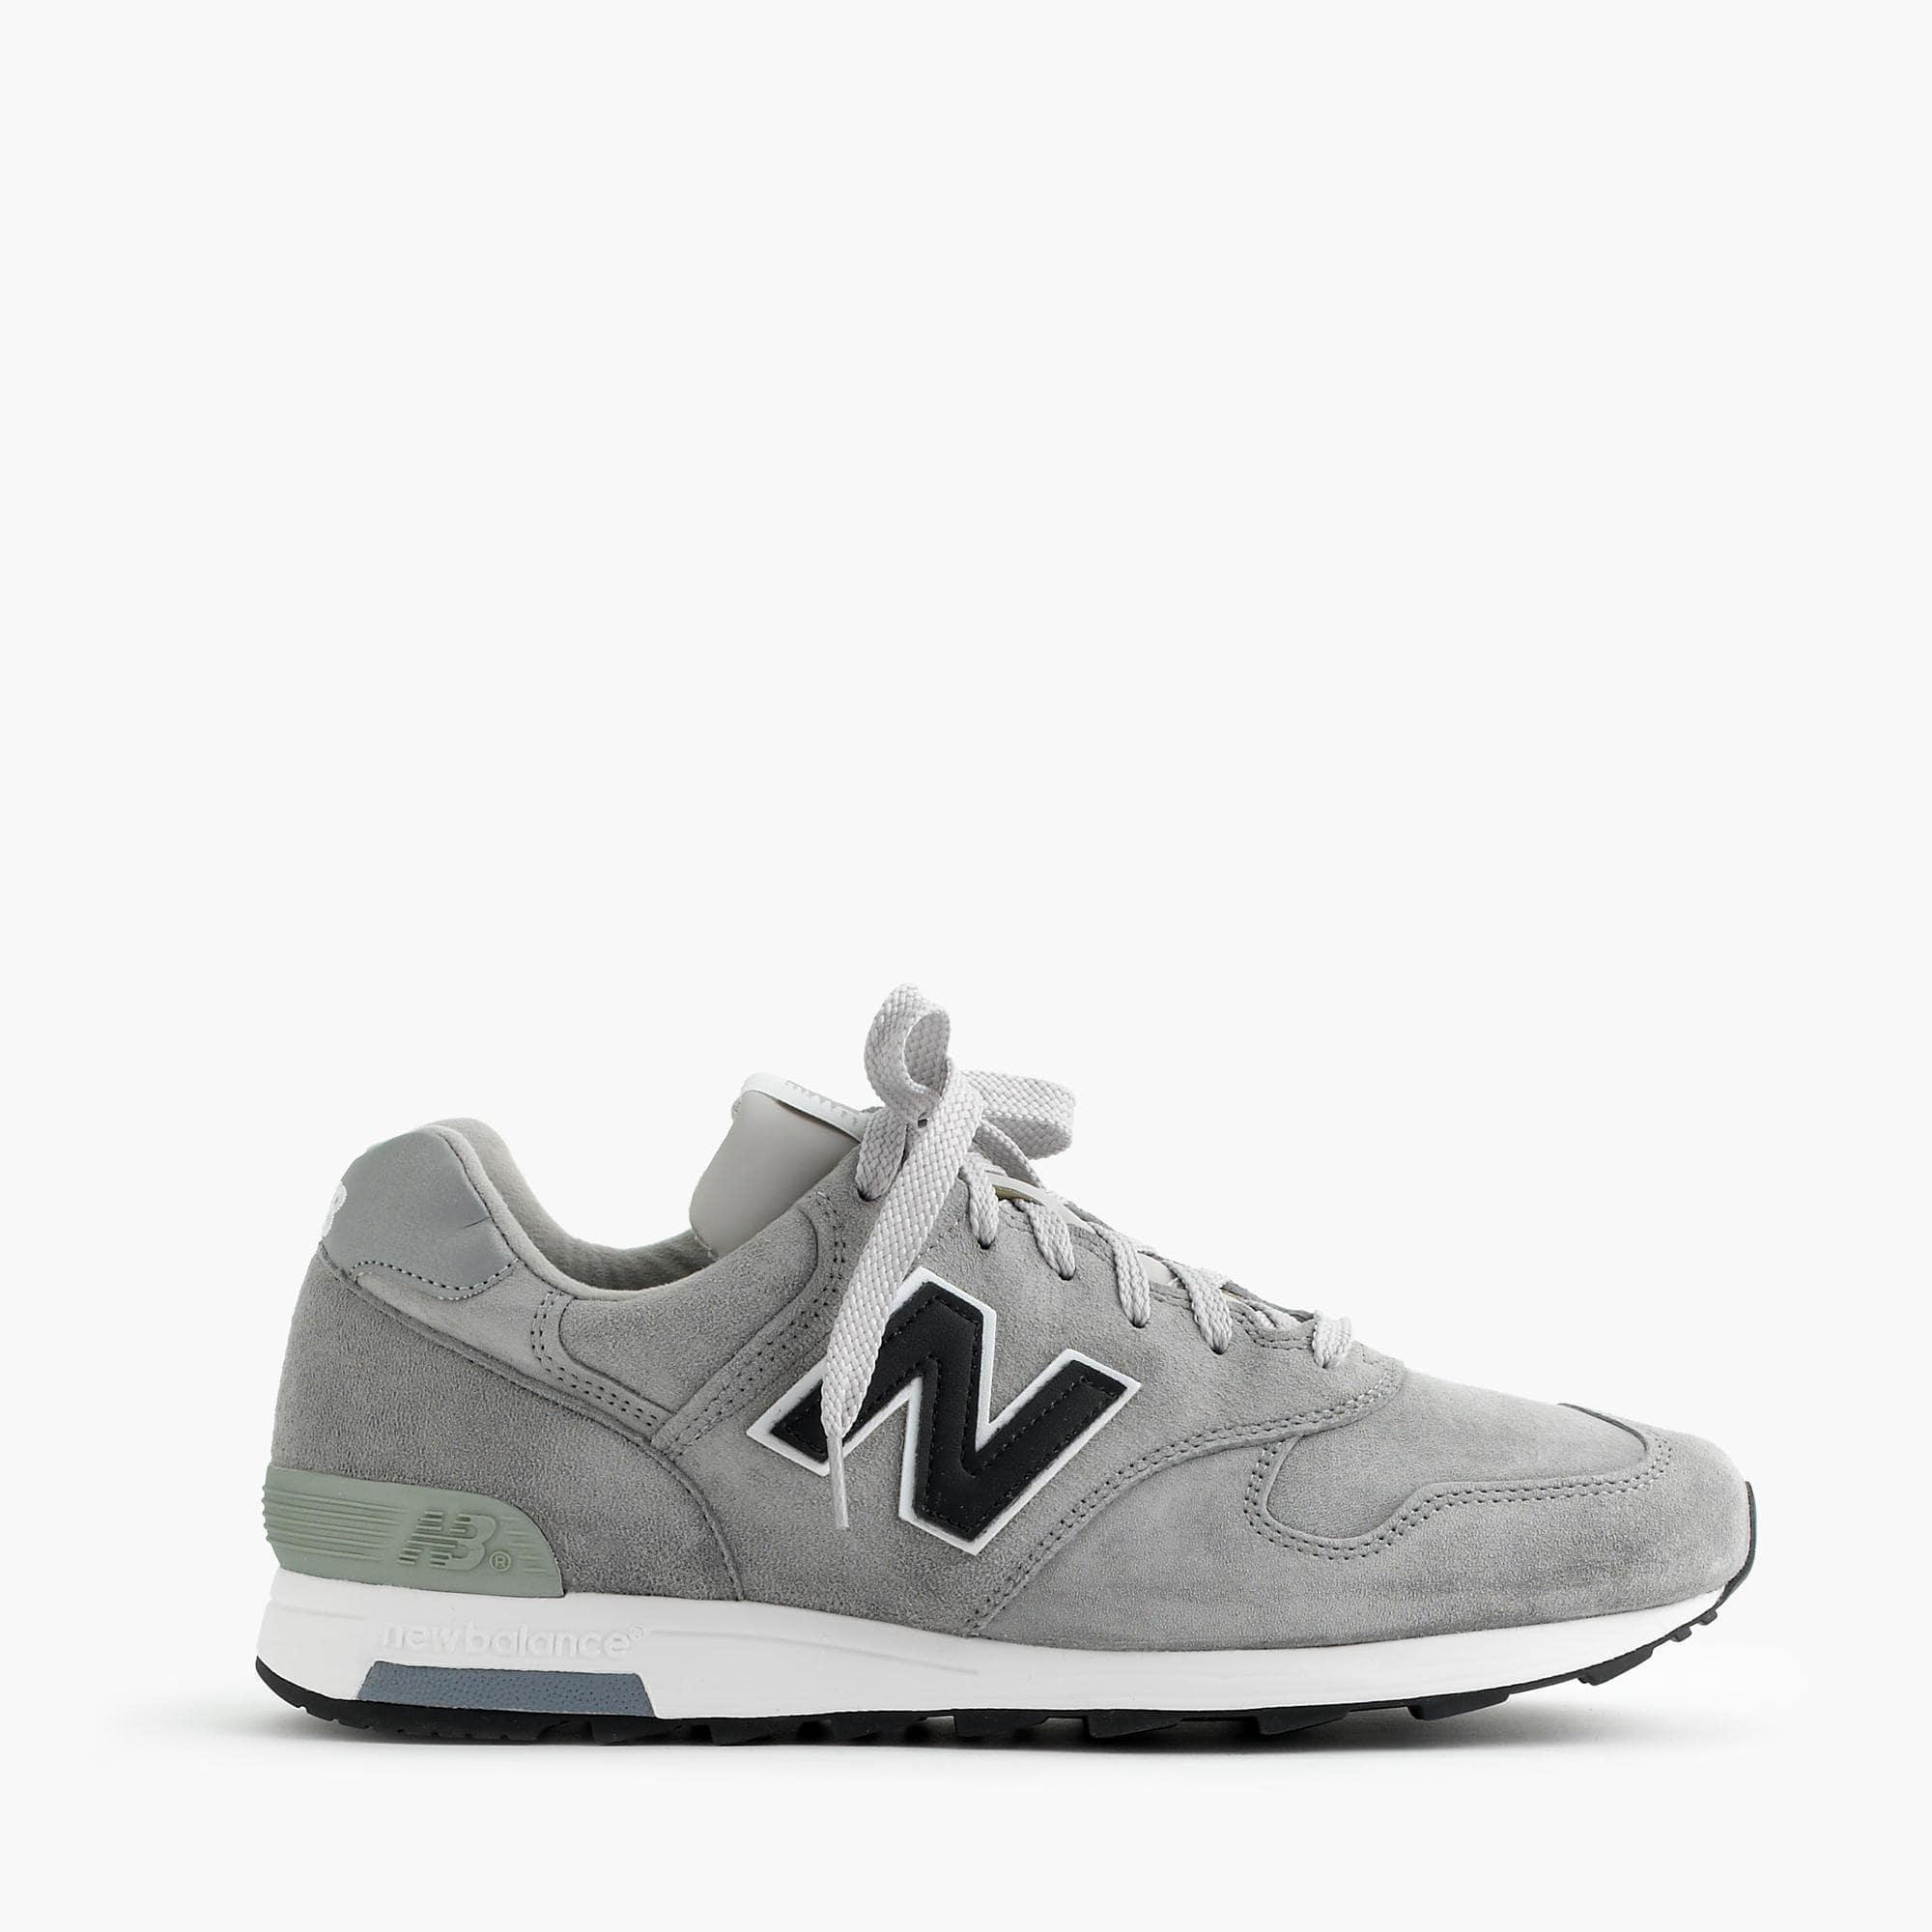 new product b266e 9106d Men's Gray 1400 Sneakers